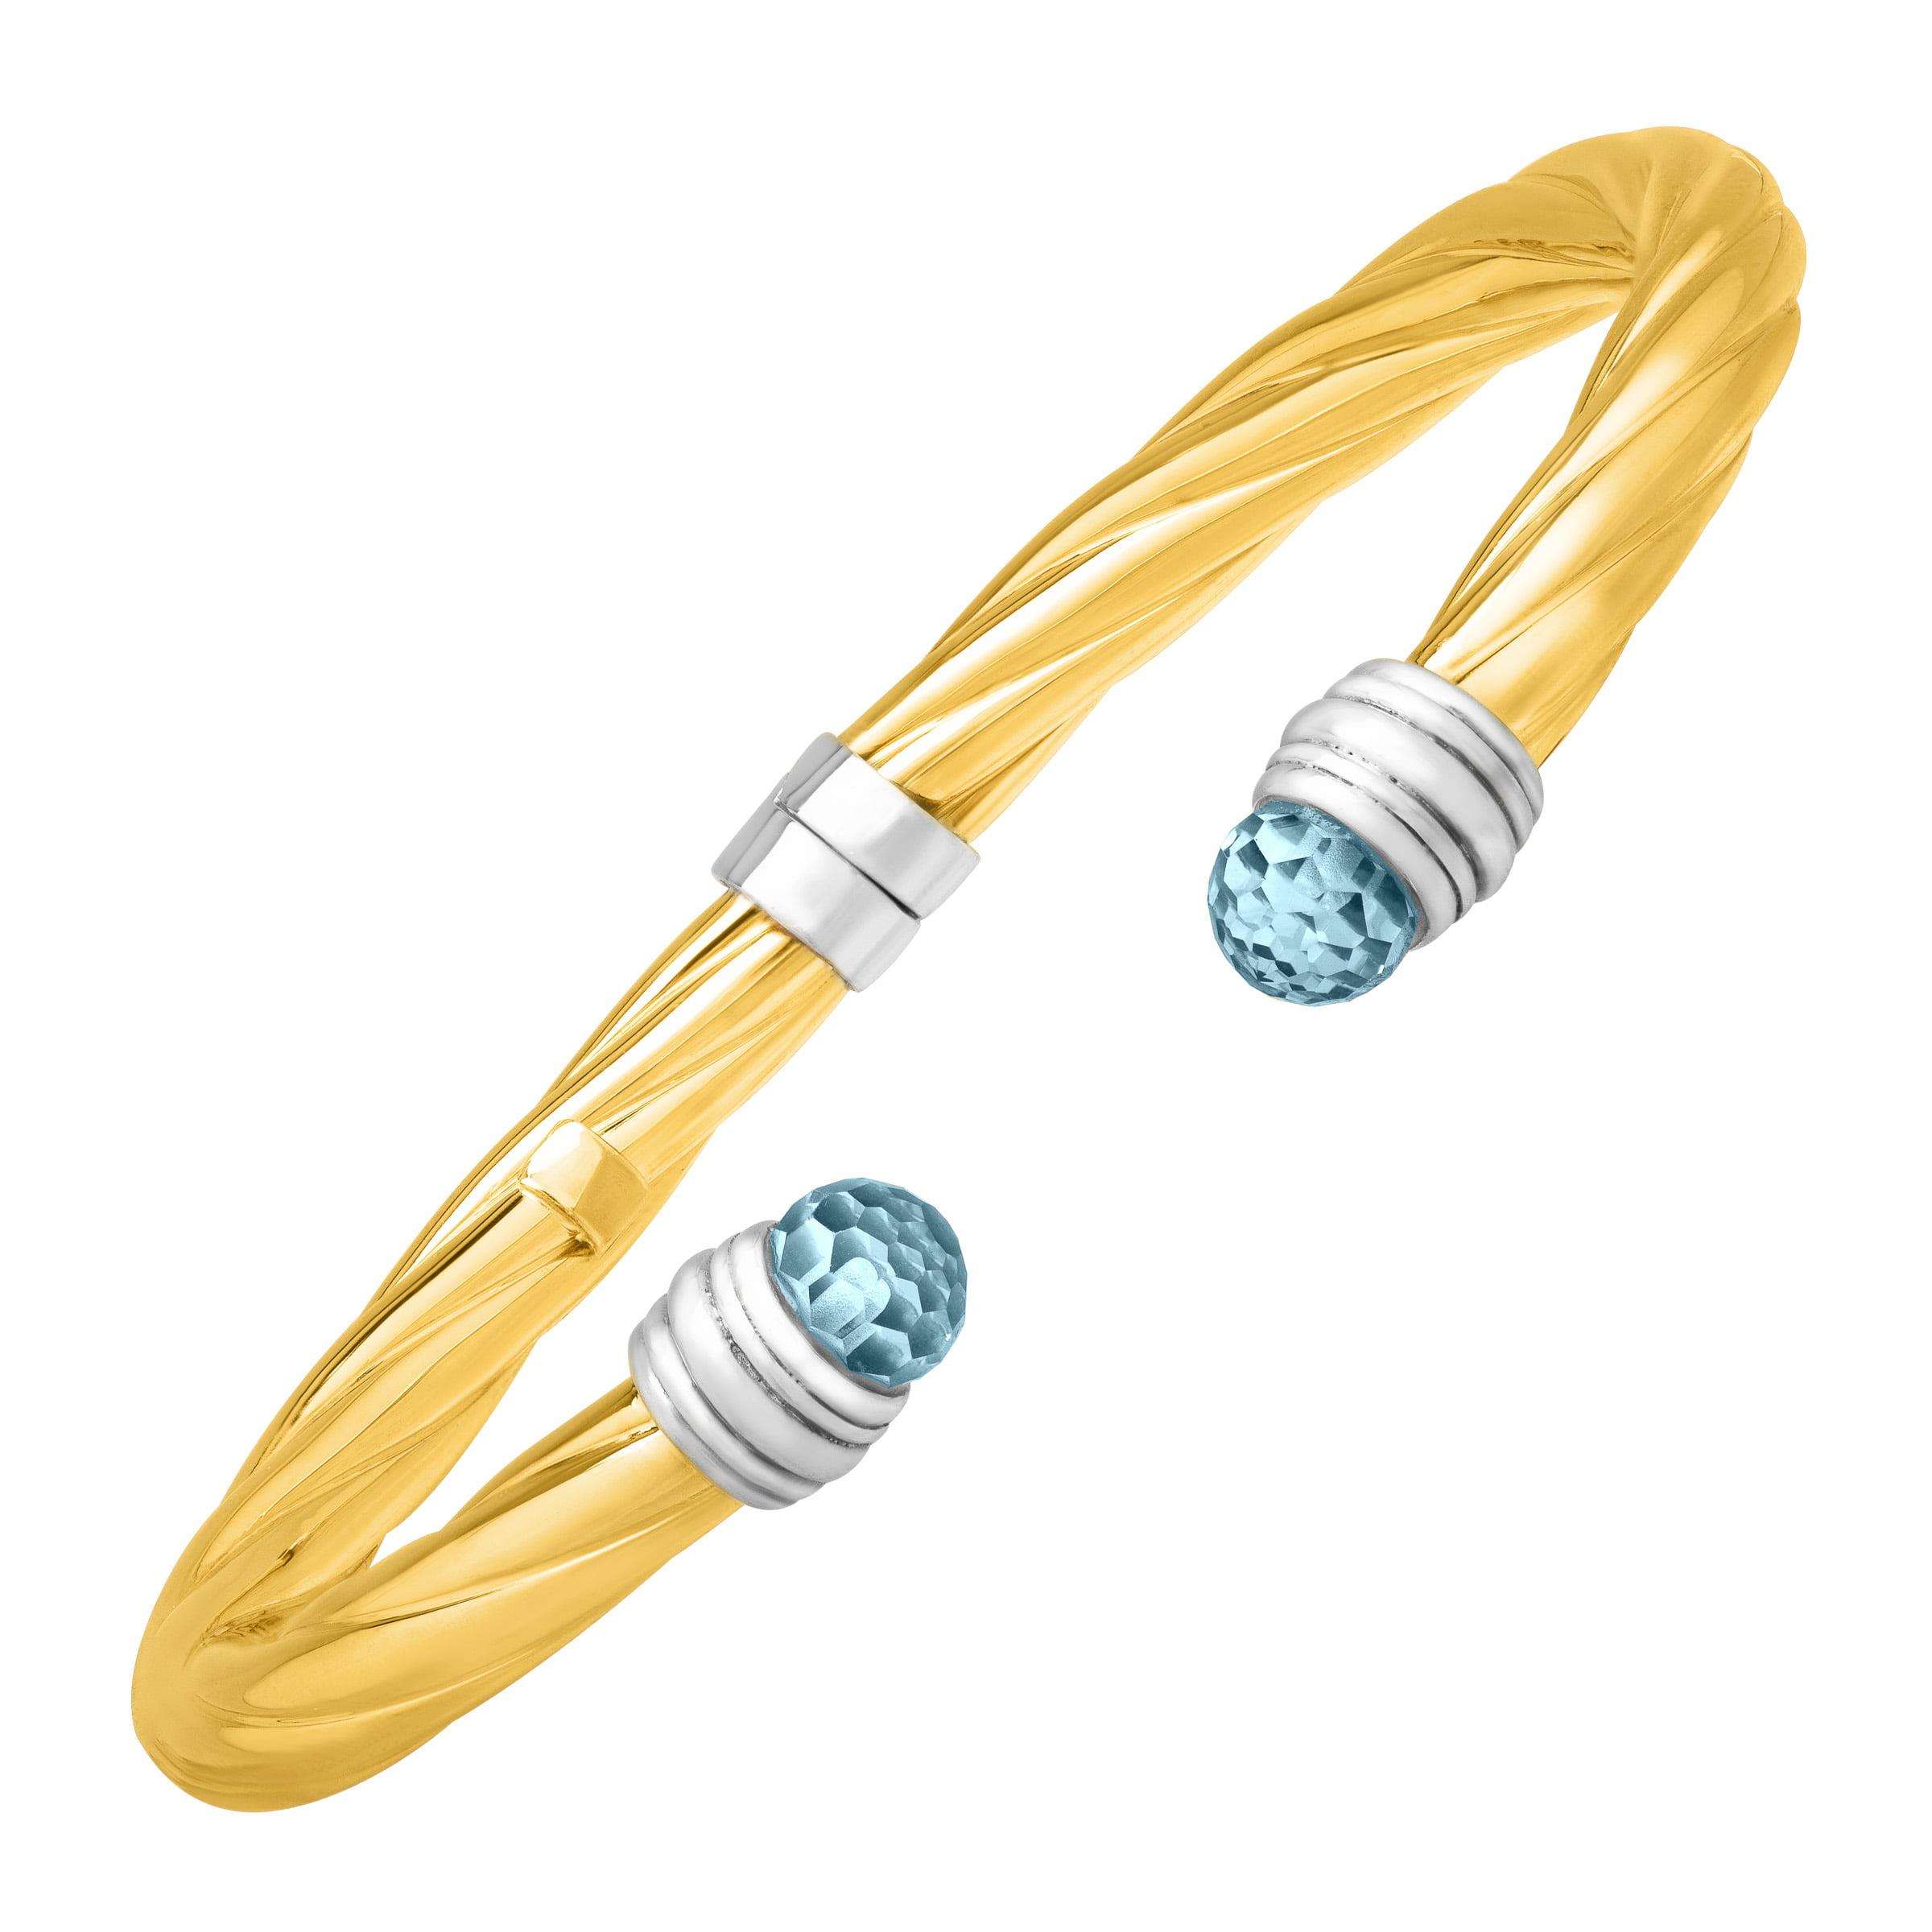 Duet Sky Blue Topaz Cuff Bracelet in Sterling Silver & 14kt Yellow Gold by Richline Group